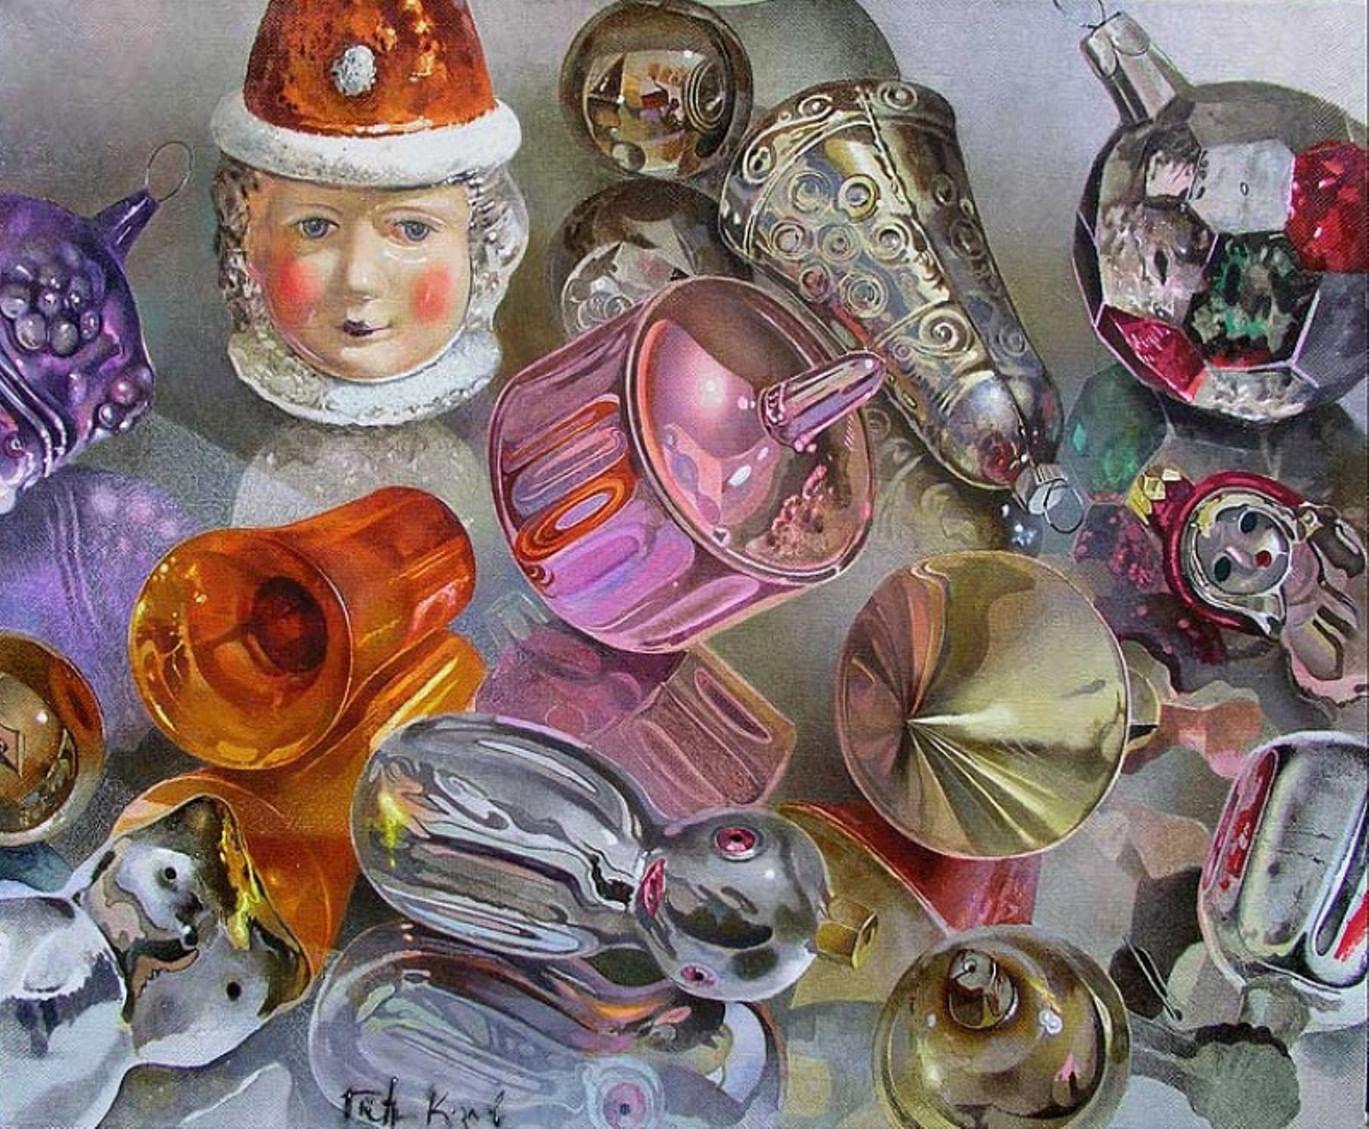 Рождество в Стране Советов. Галерея 4